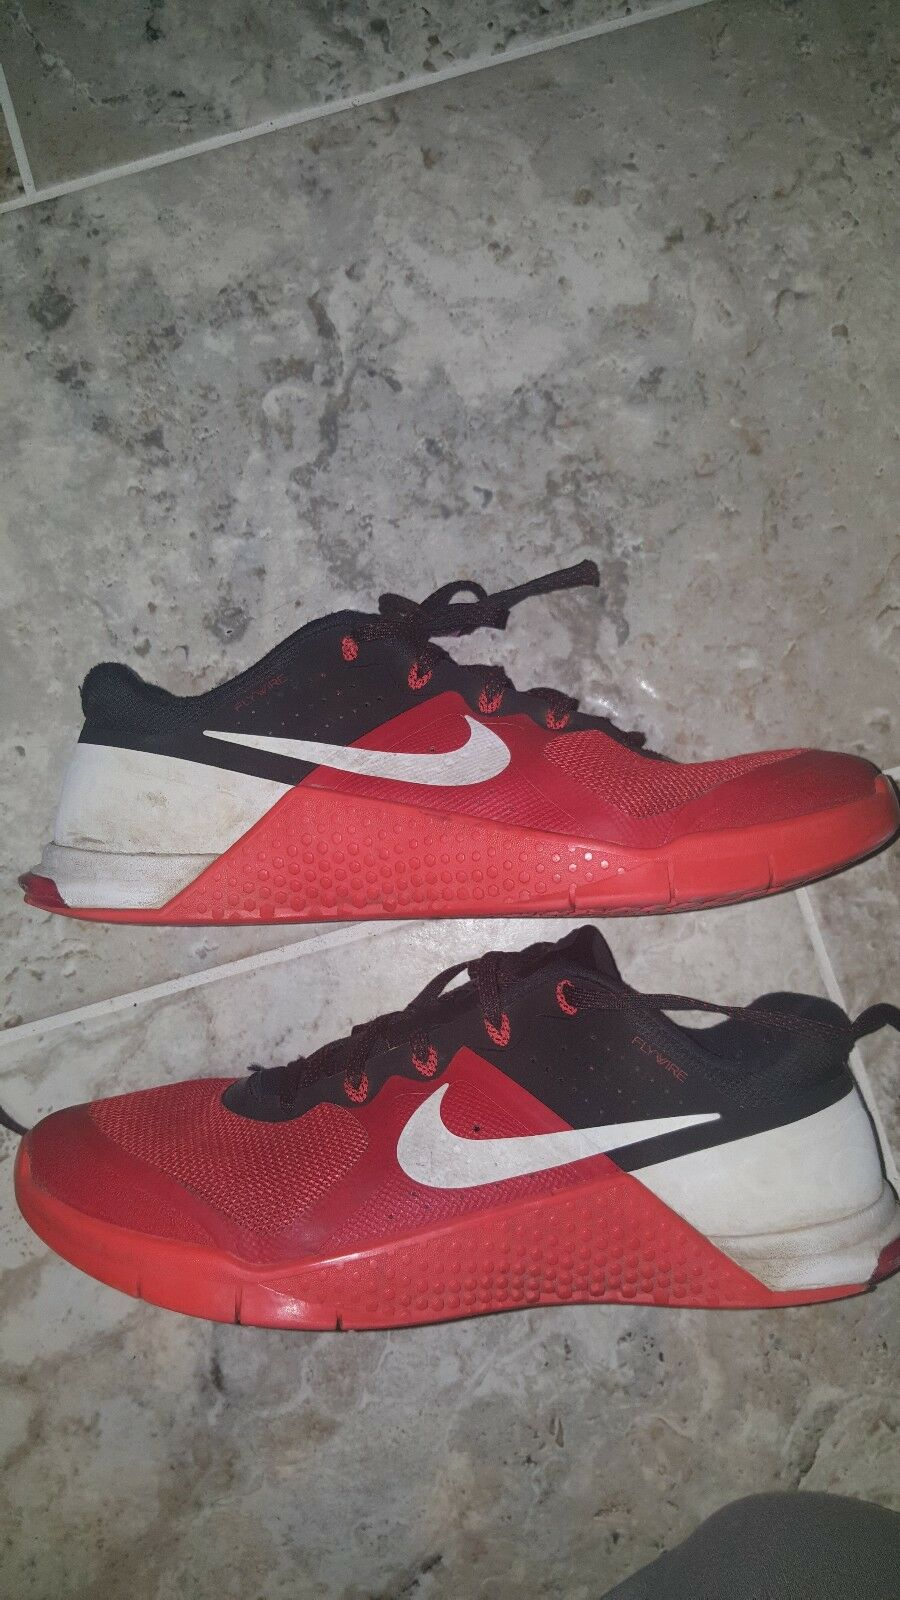 Nike Metcon 2 Men Shoes Action Red/Black/White 819899-601 Size US8 UK7